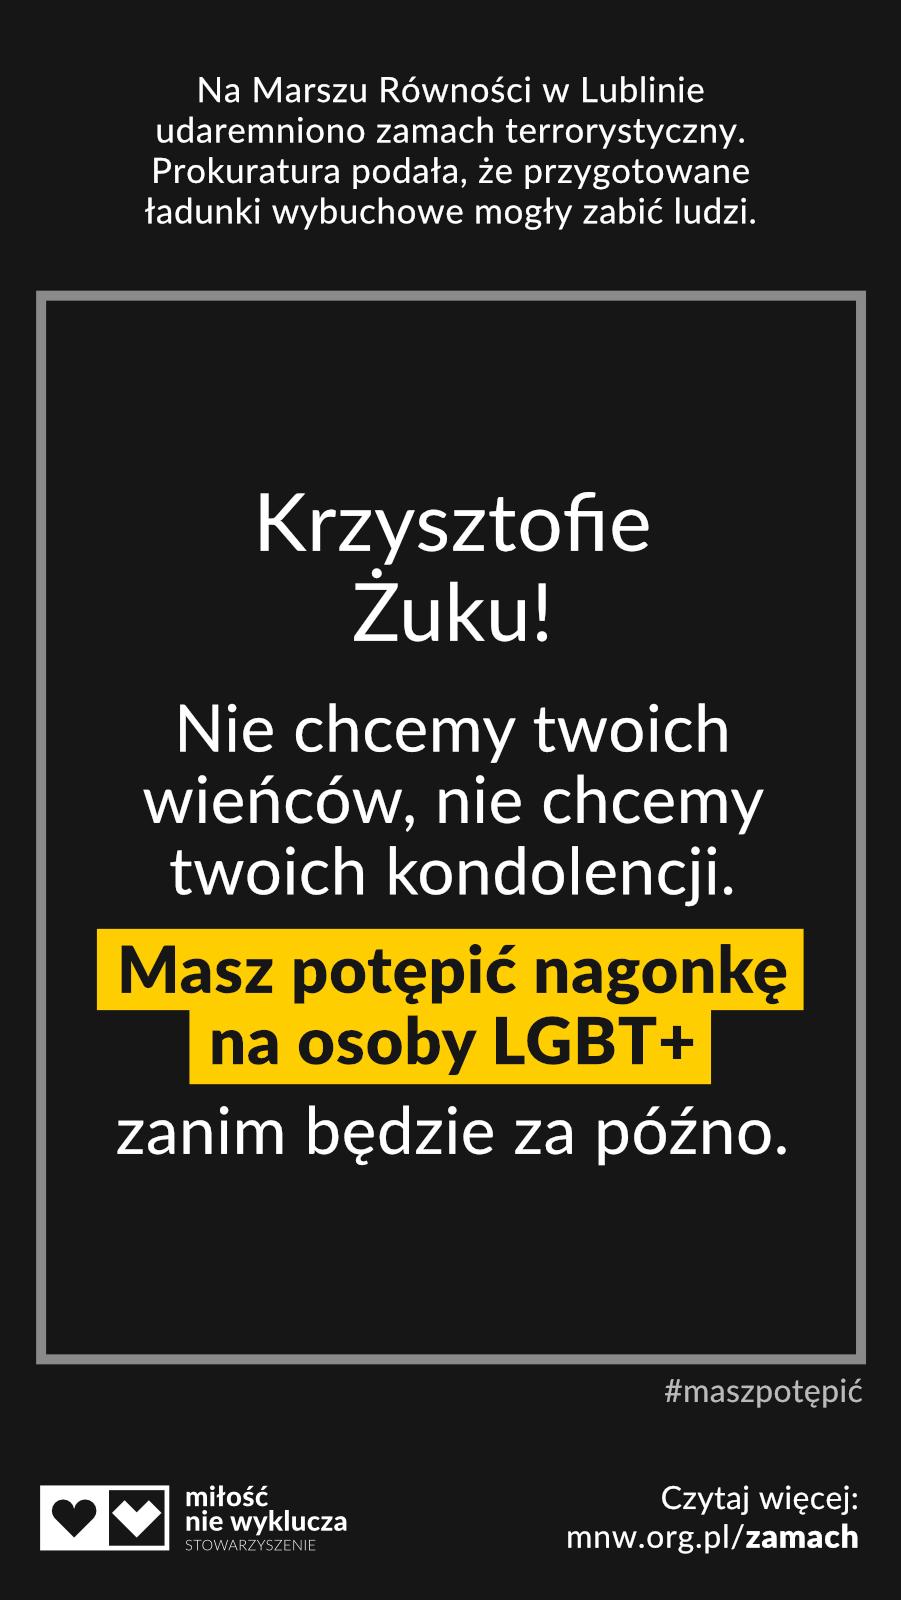 Krzysztof Żuk #maszpotepic zamach LGBT+